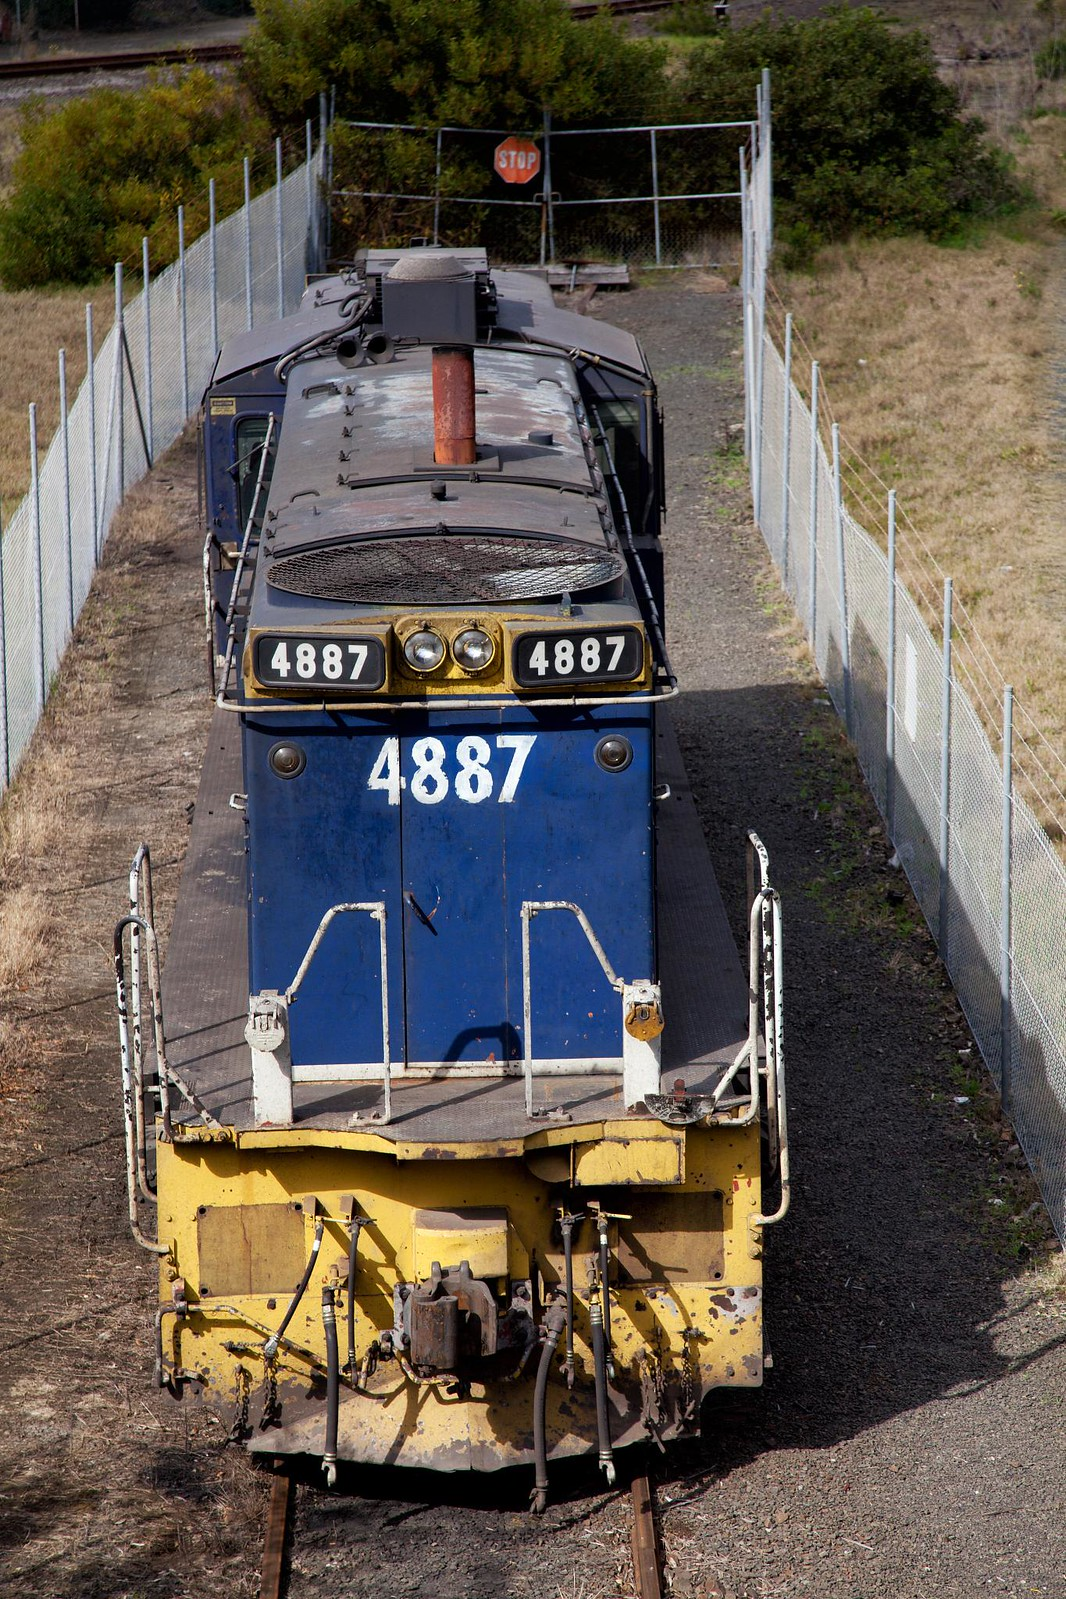 4887 at Pt Kembla by Trent